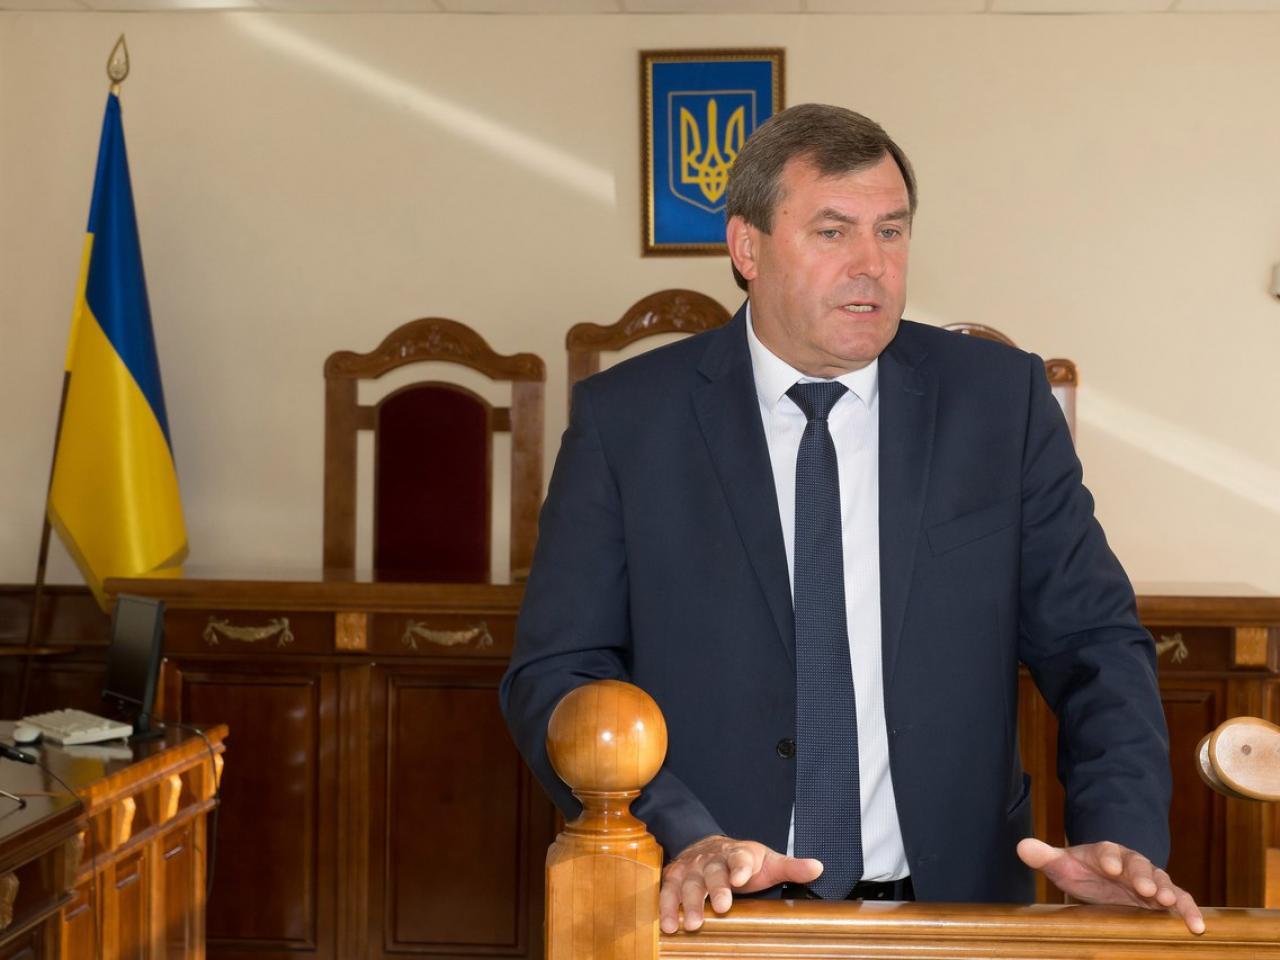 Волинянин Петро Філюк склав присягу в КСУ